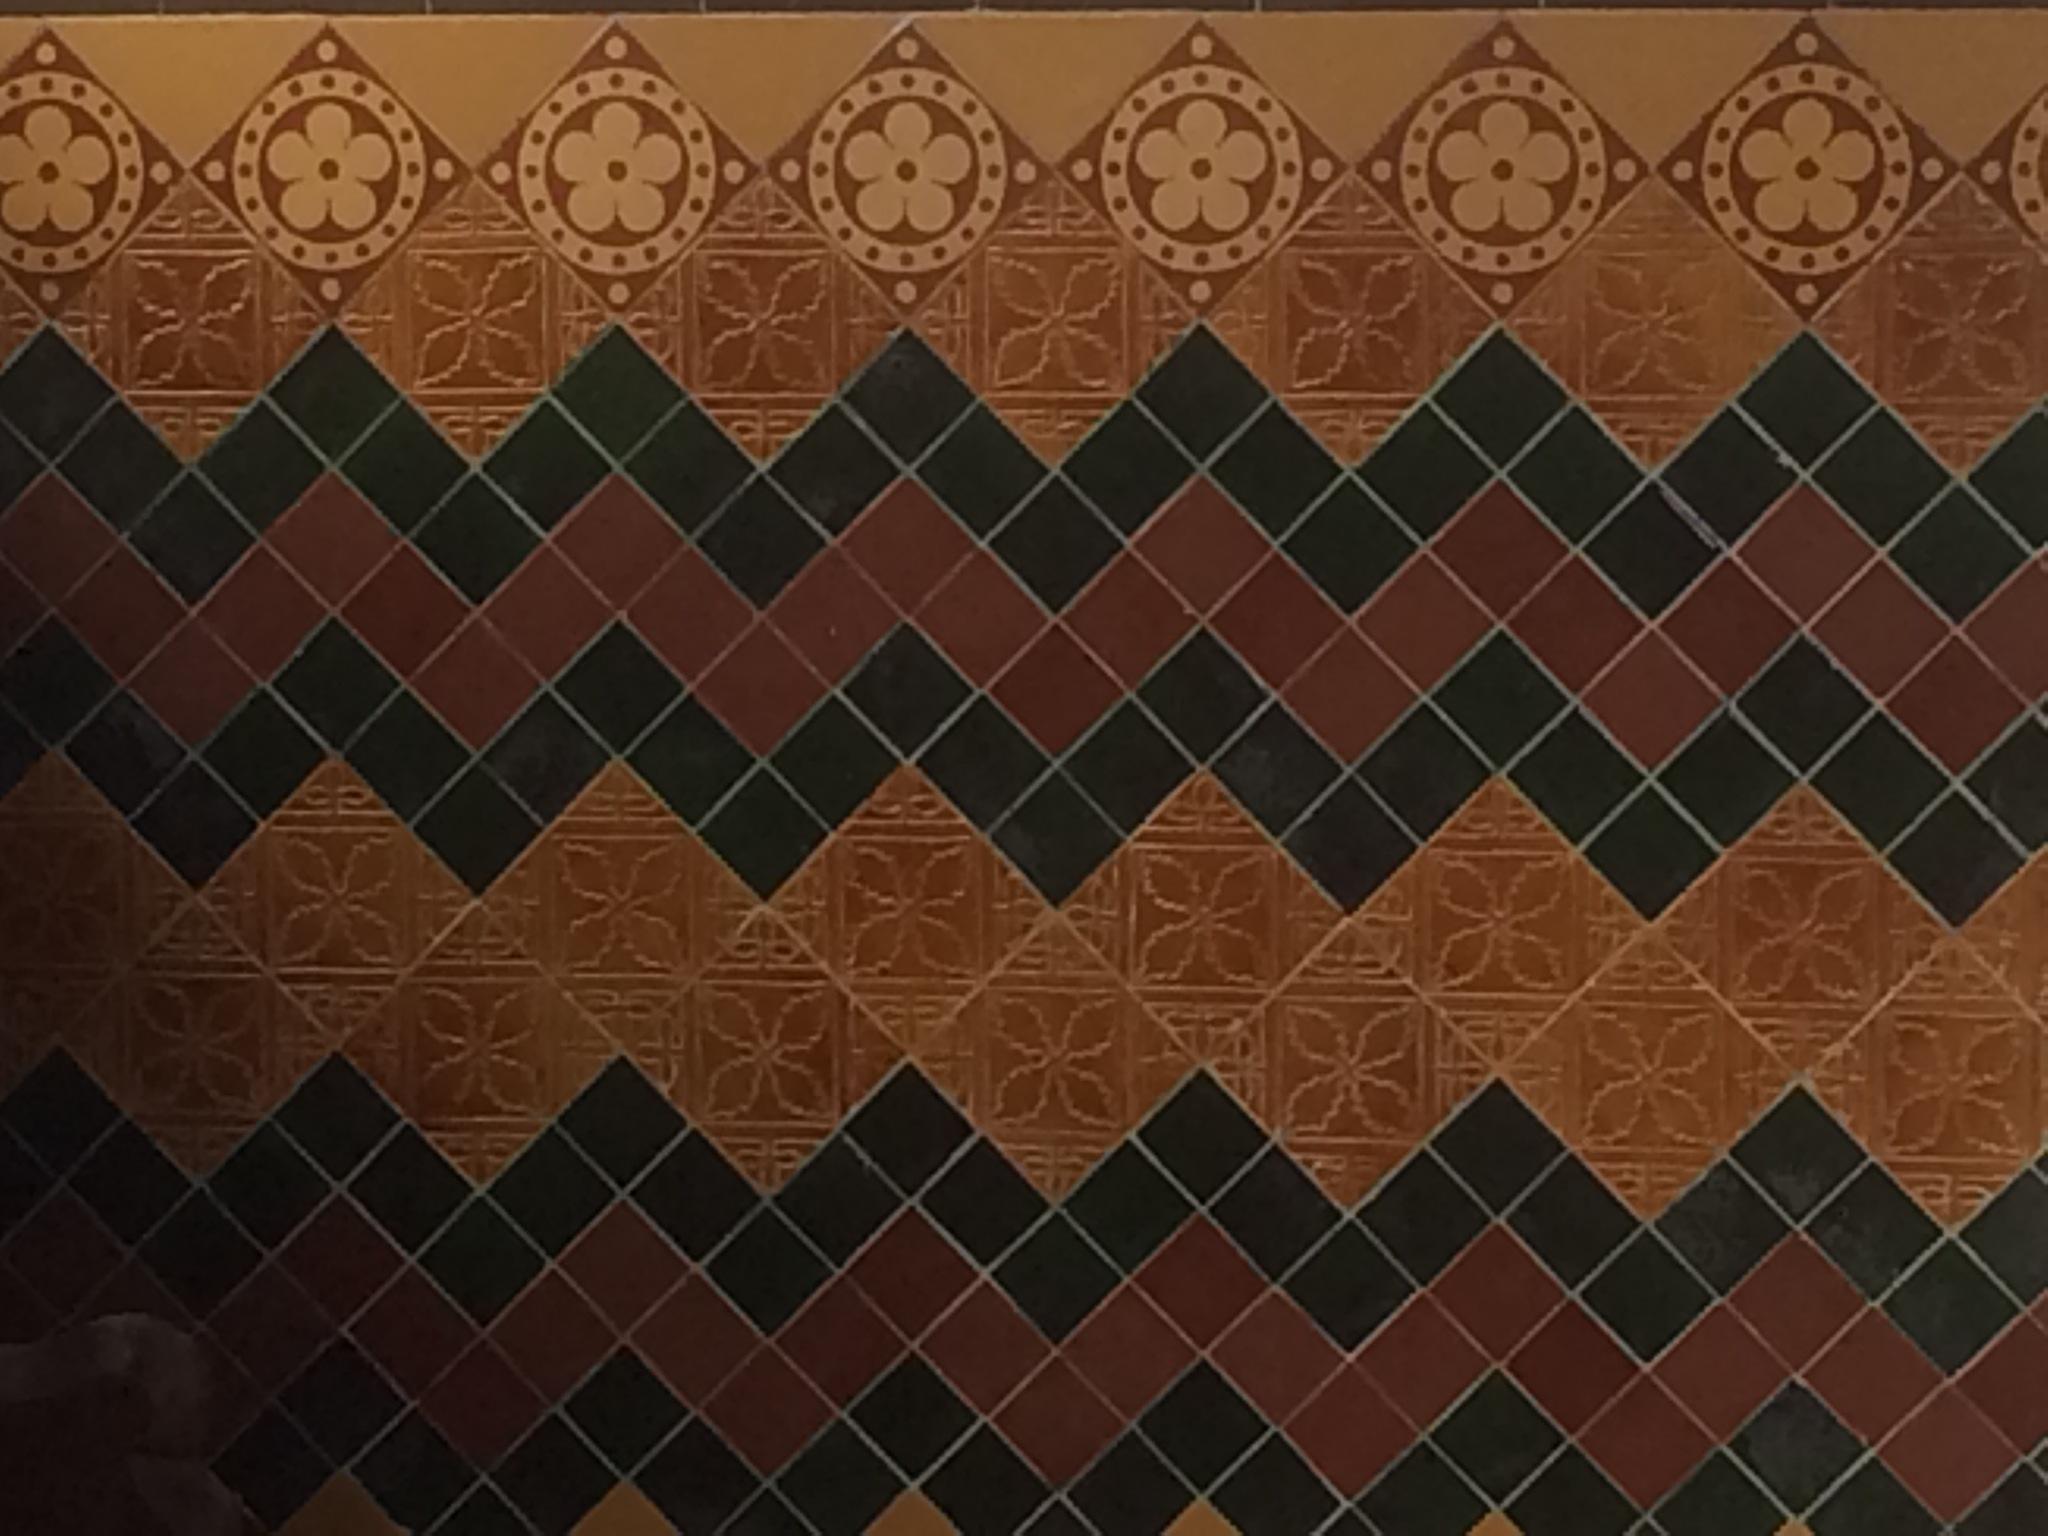 Funky Wall Tiling  by HelenaM